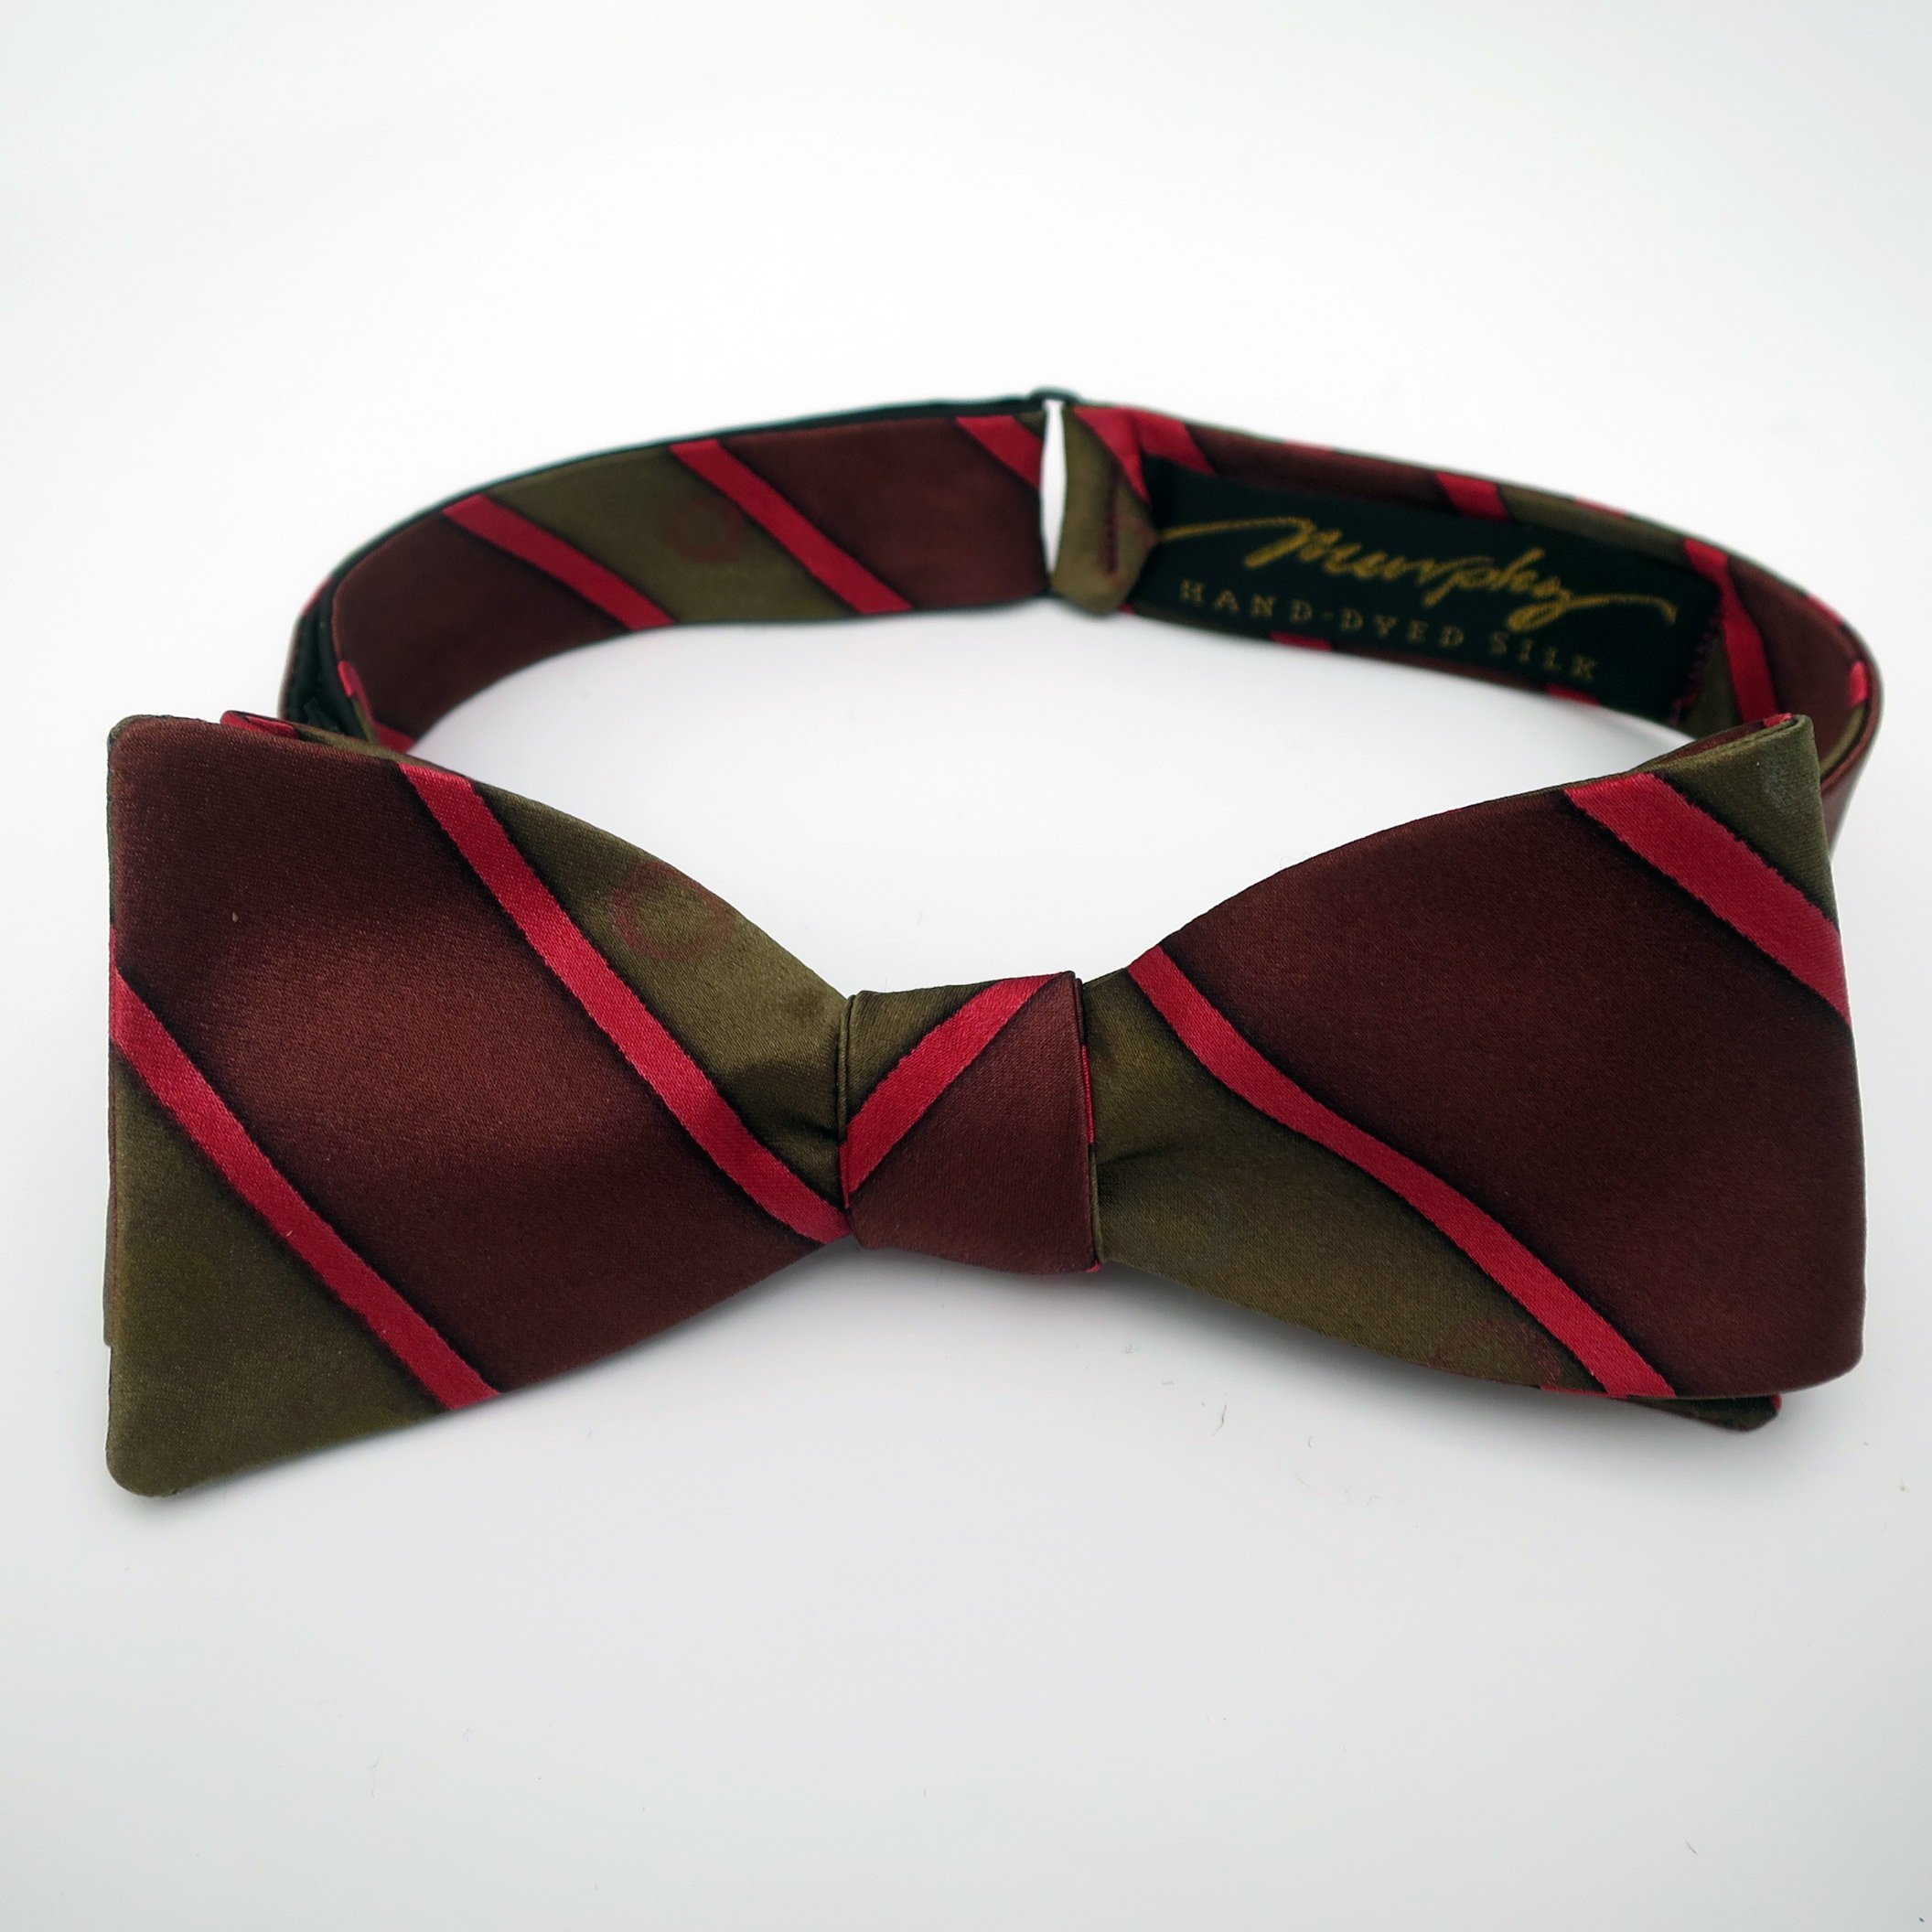 100% Silk Hand-Painted Hand-Made Men's Self Tie Bow Tie ''Champagne'' Art to Wear by Murphyties by Murphyties Inc.